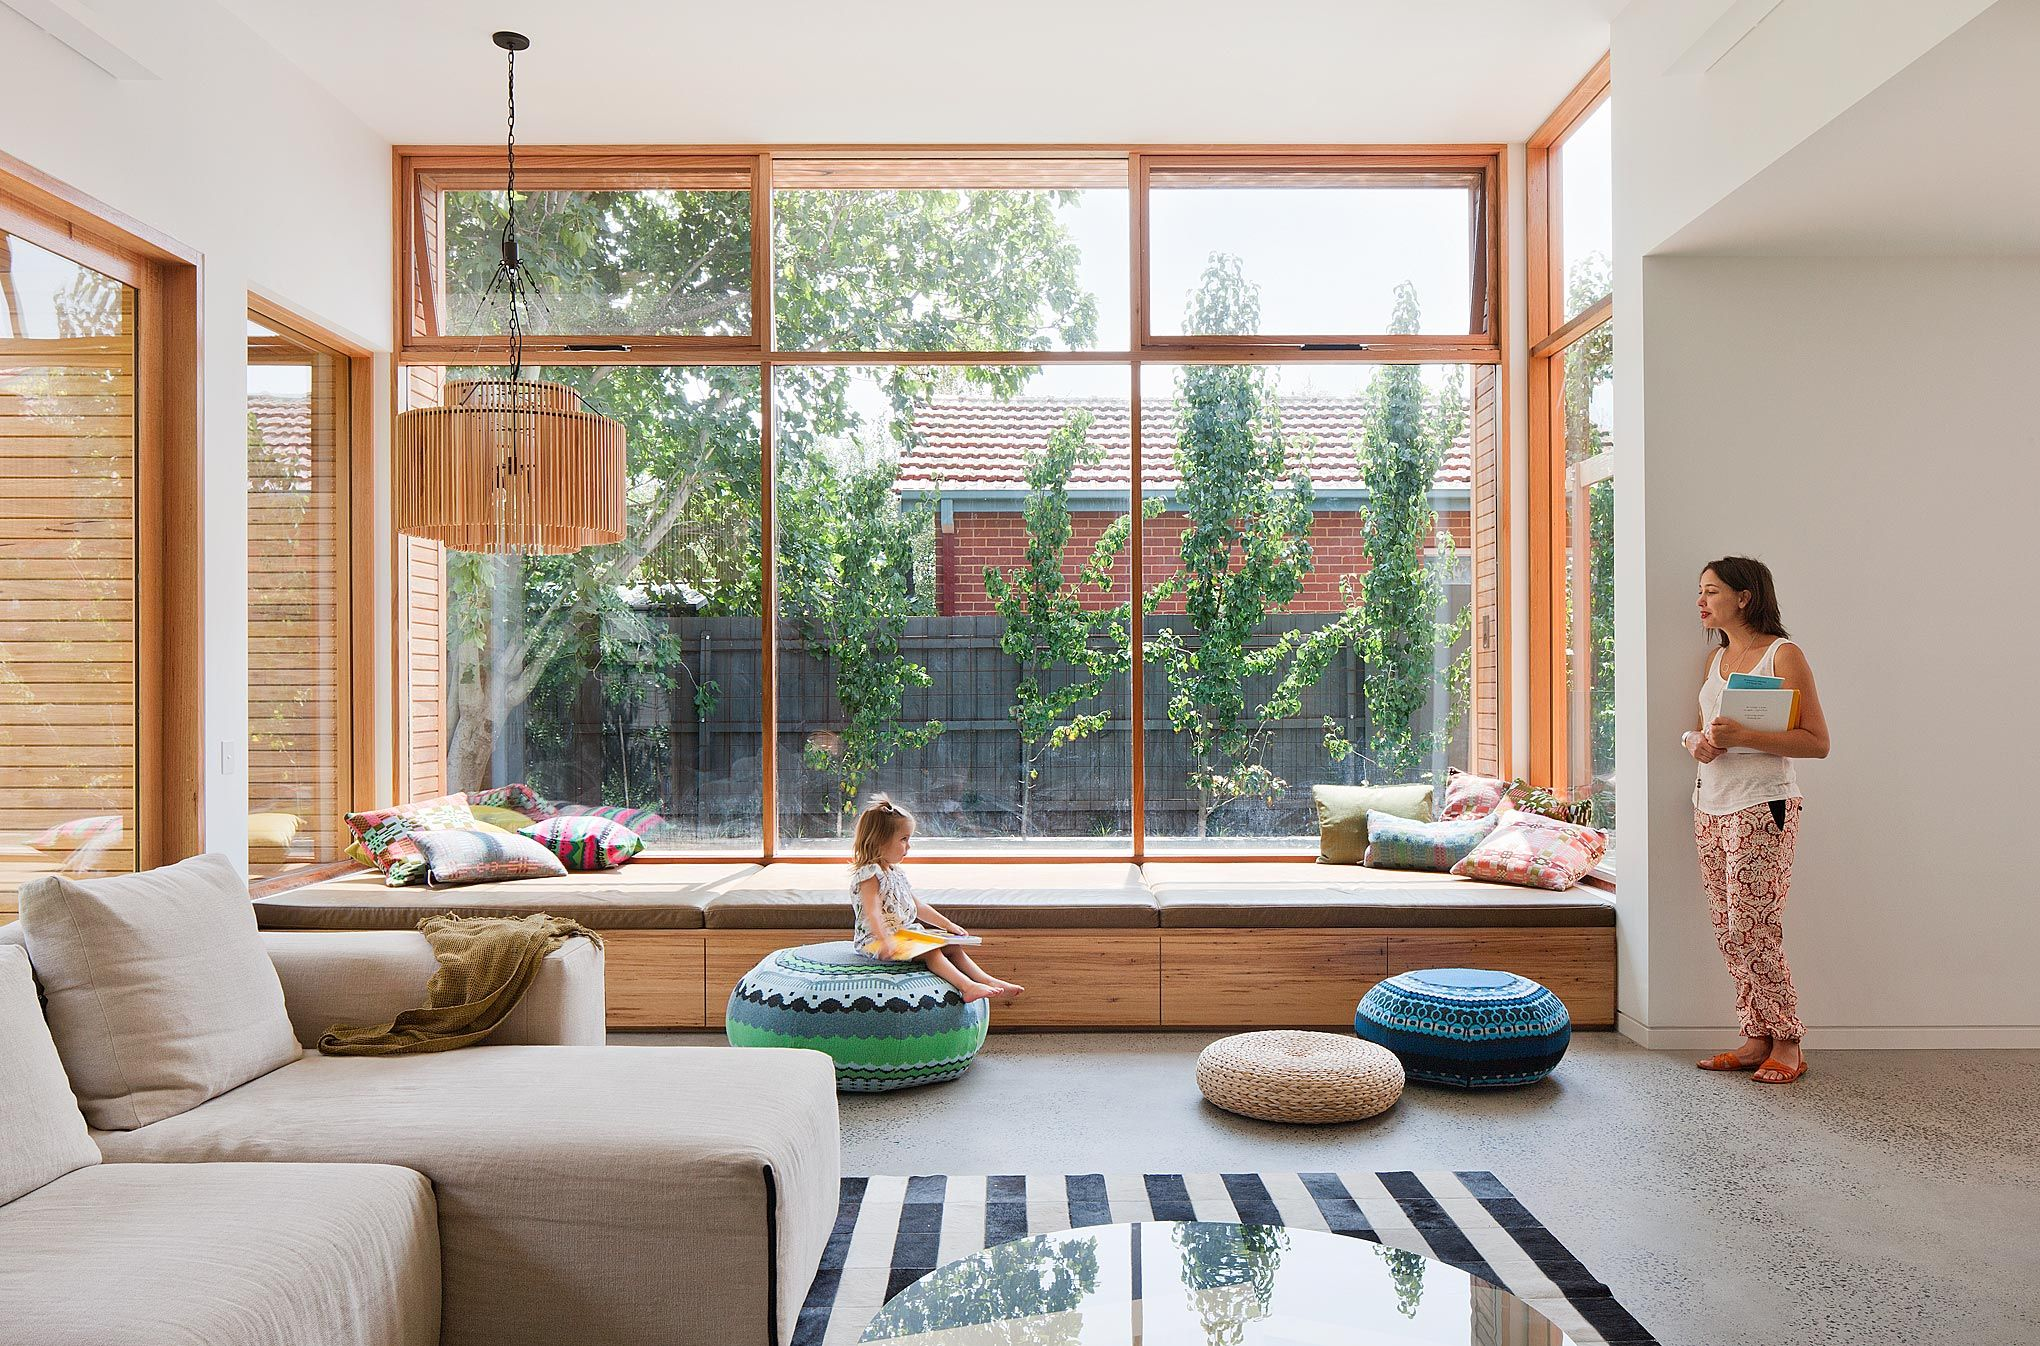 Bg Architecture Balaclava Interior Window Sitting Bench Wood Light Cool Living Room Window Design Ideas Inspiration Design